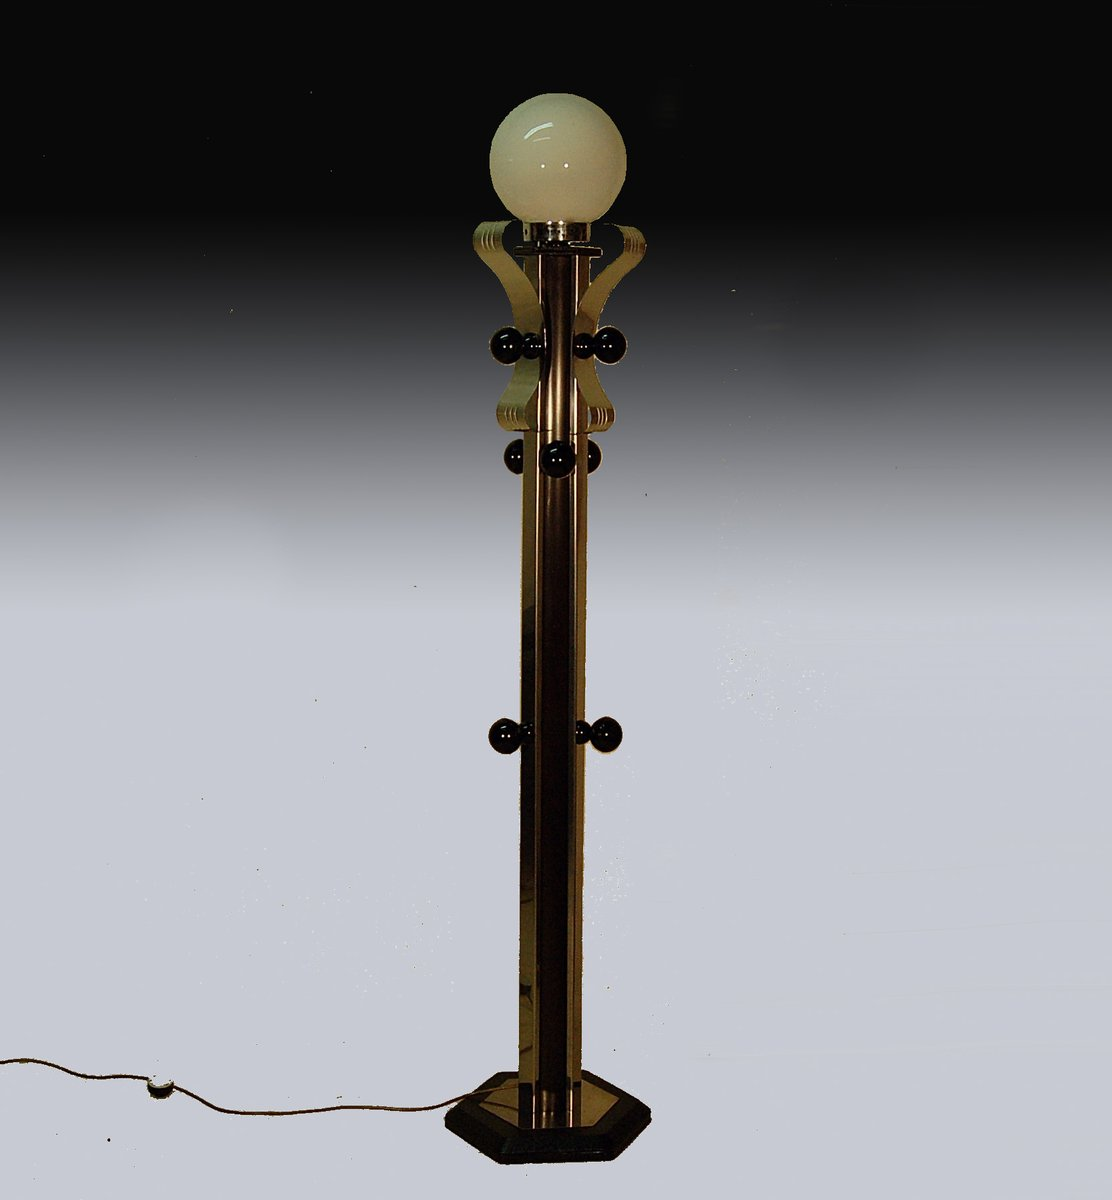 Mid century italian coat rack floor lamp 1970s for sale at pamono for 1970s floor lamps